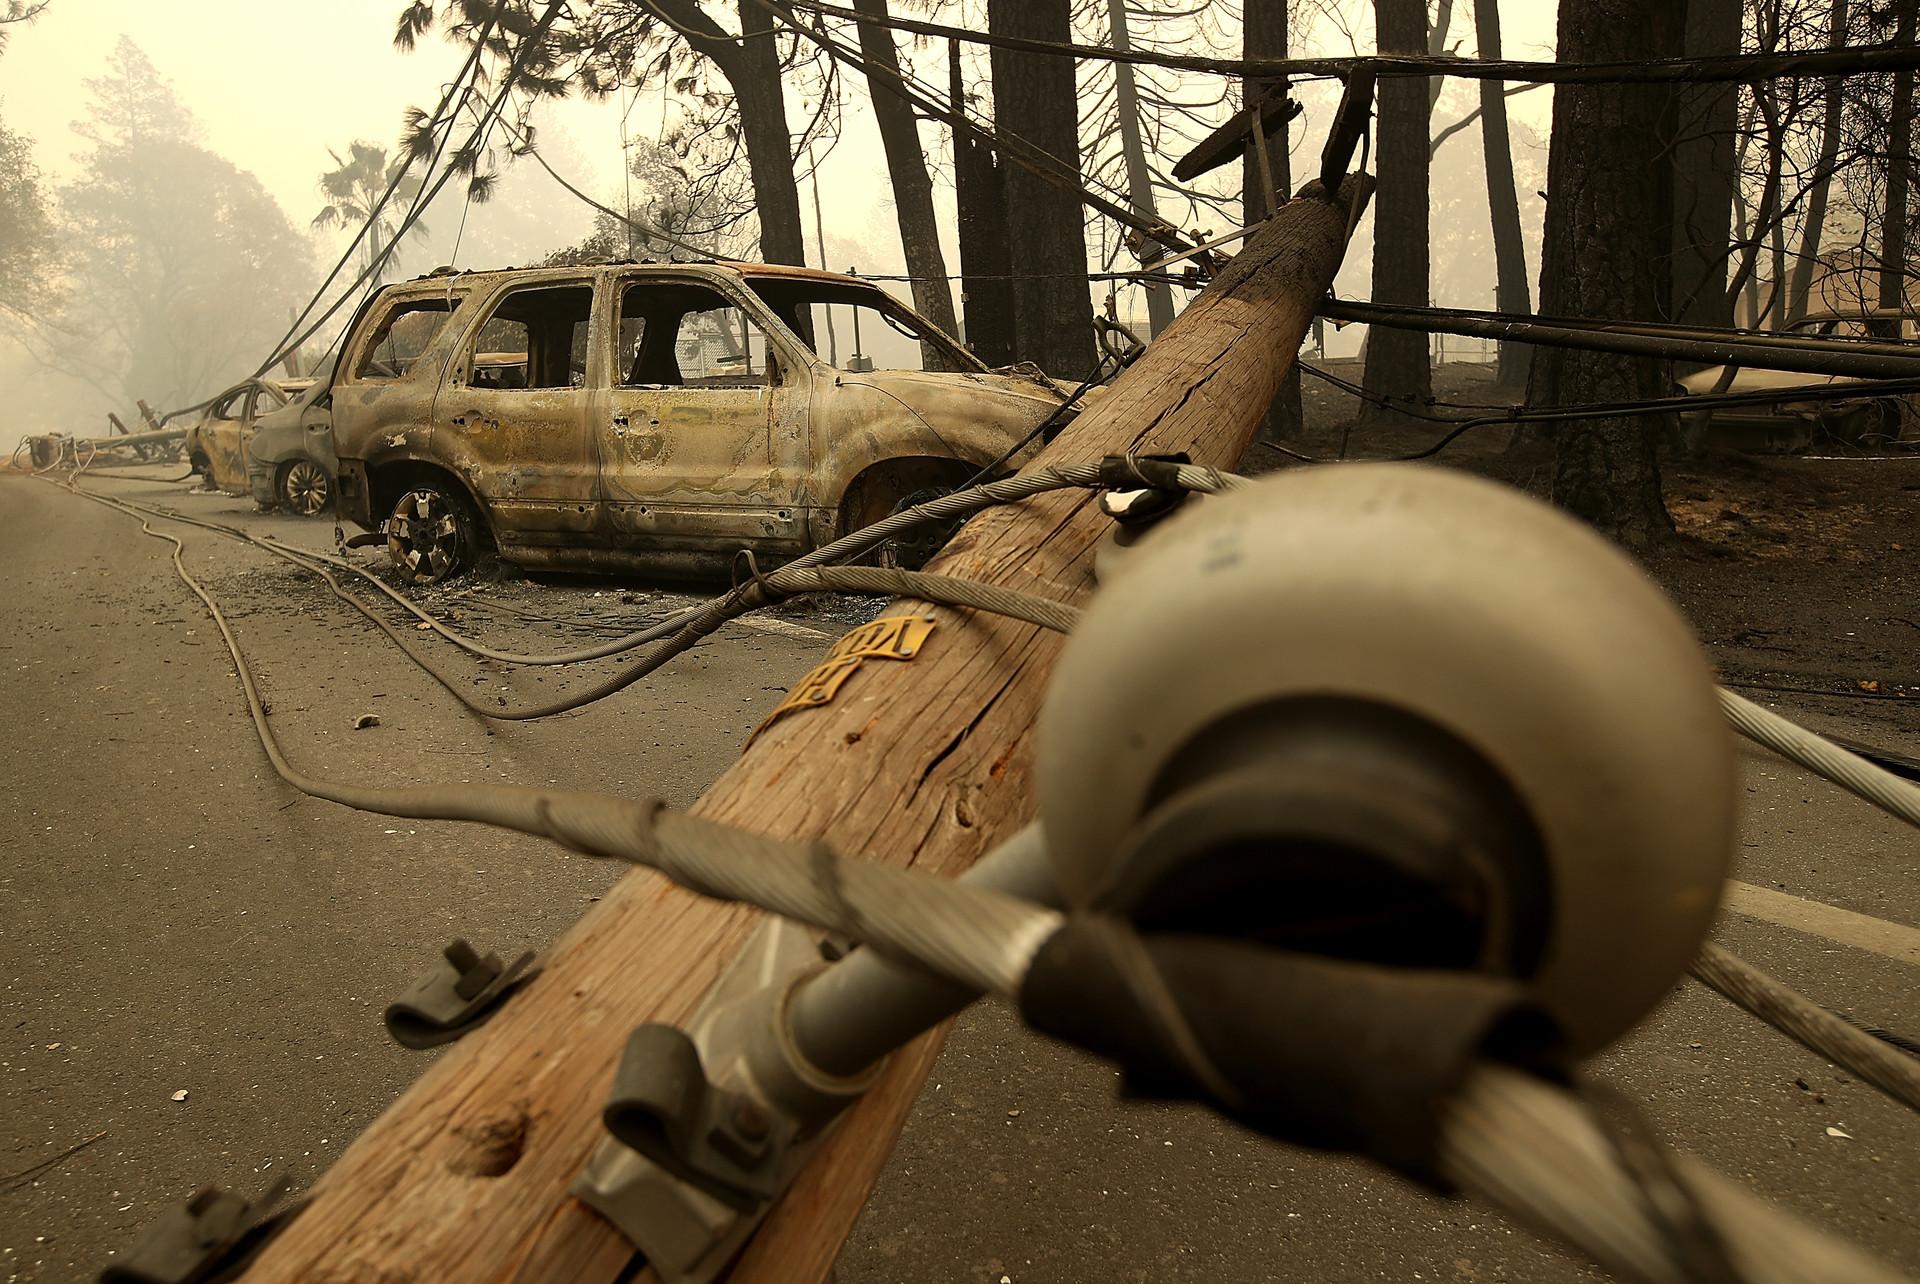 California Legislature Approves Wildfire Bill, Utility Customers to Pay $10.5 Billion Into Fund